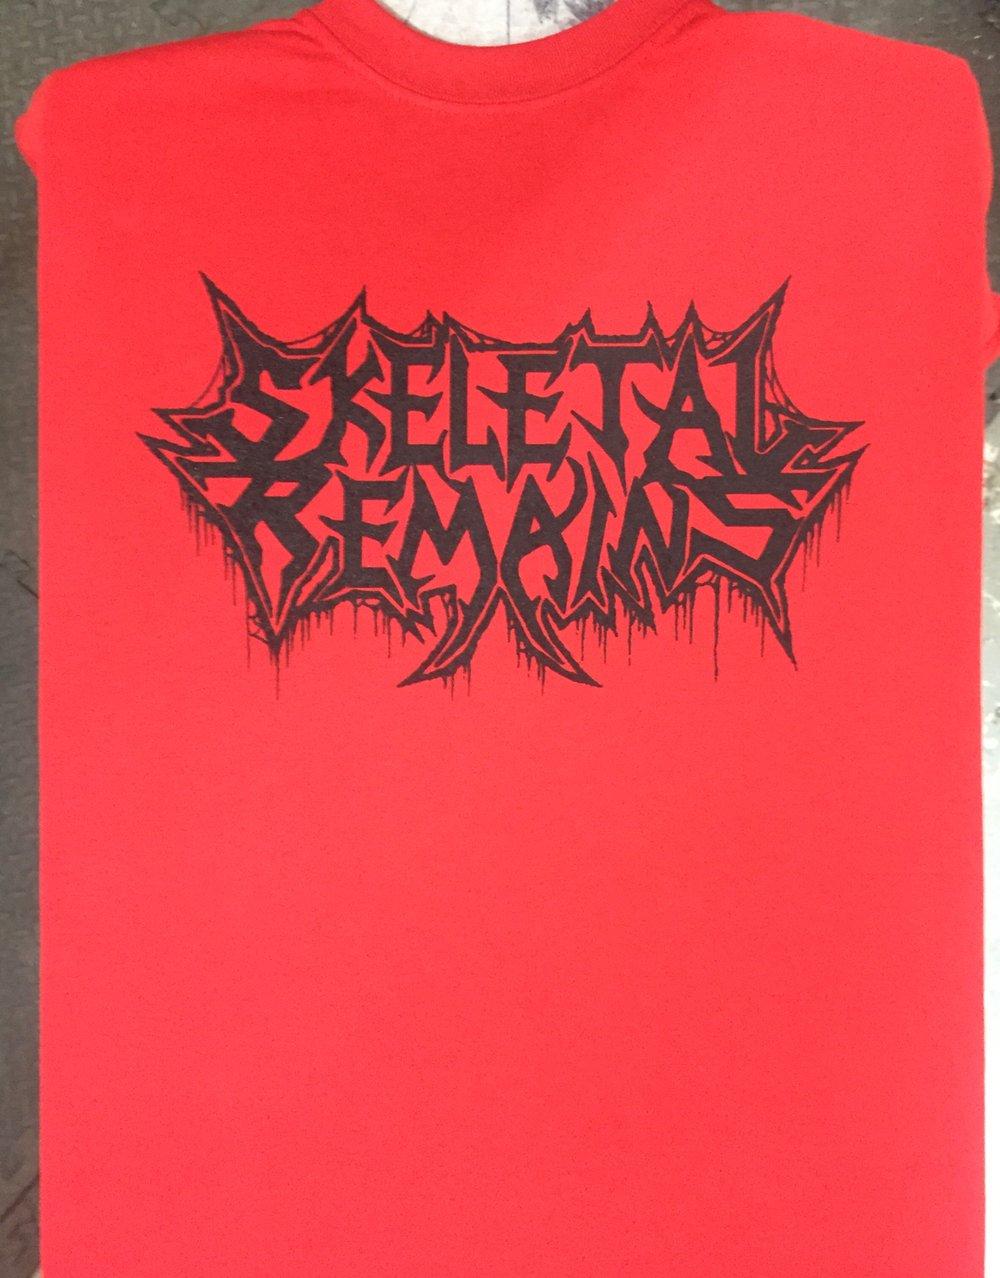 Skeletal Remains Logo t-shirt